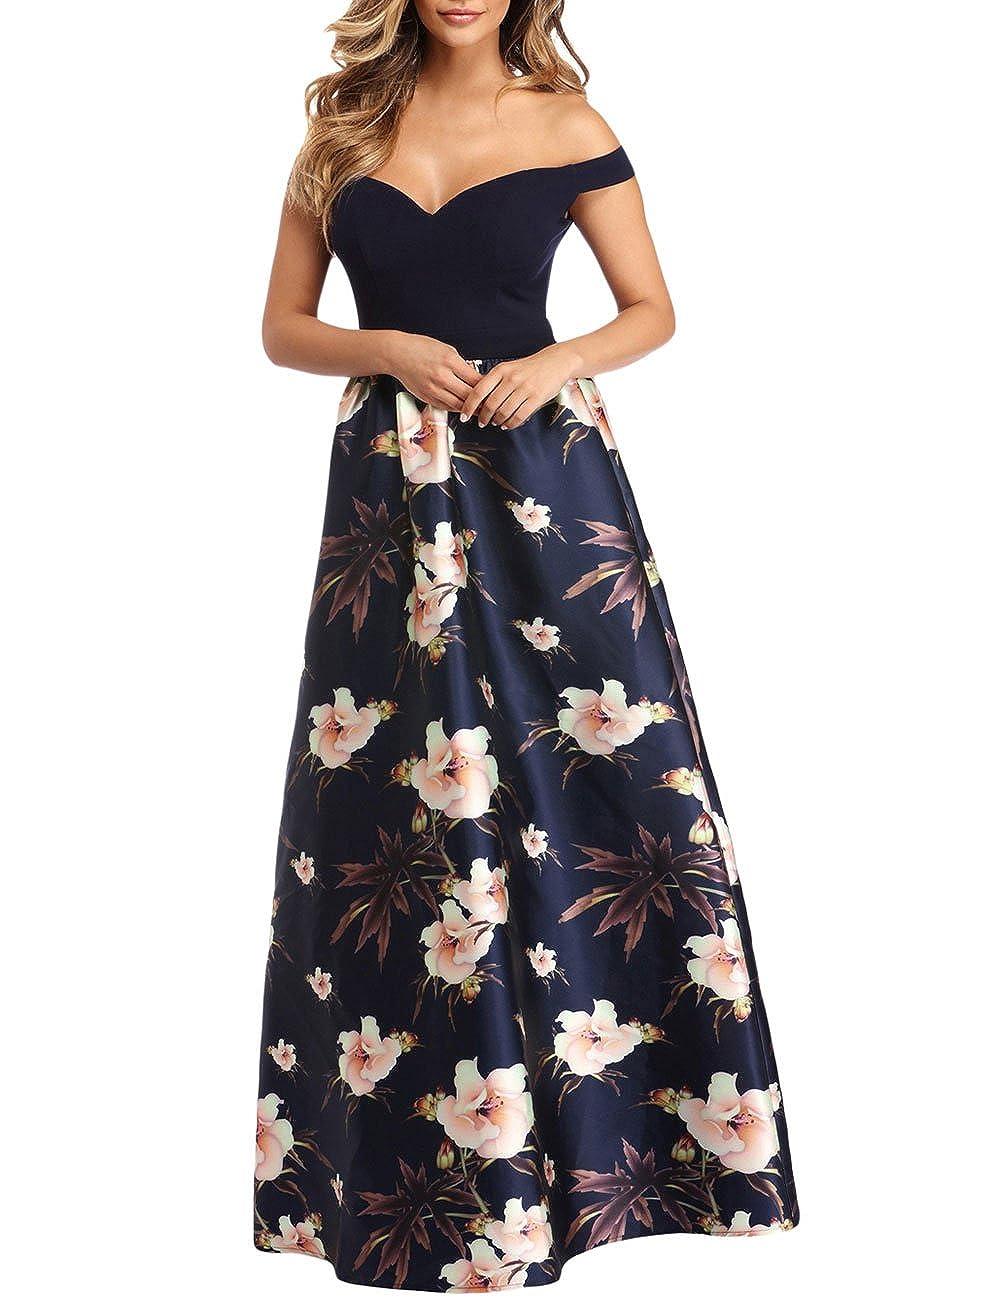 ca7b8b7ac97 Off Shoulder Bodice Empire Waist Maxi Prom Evening Dress Floral Print Gown